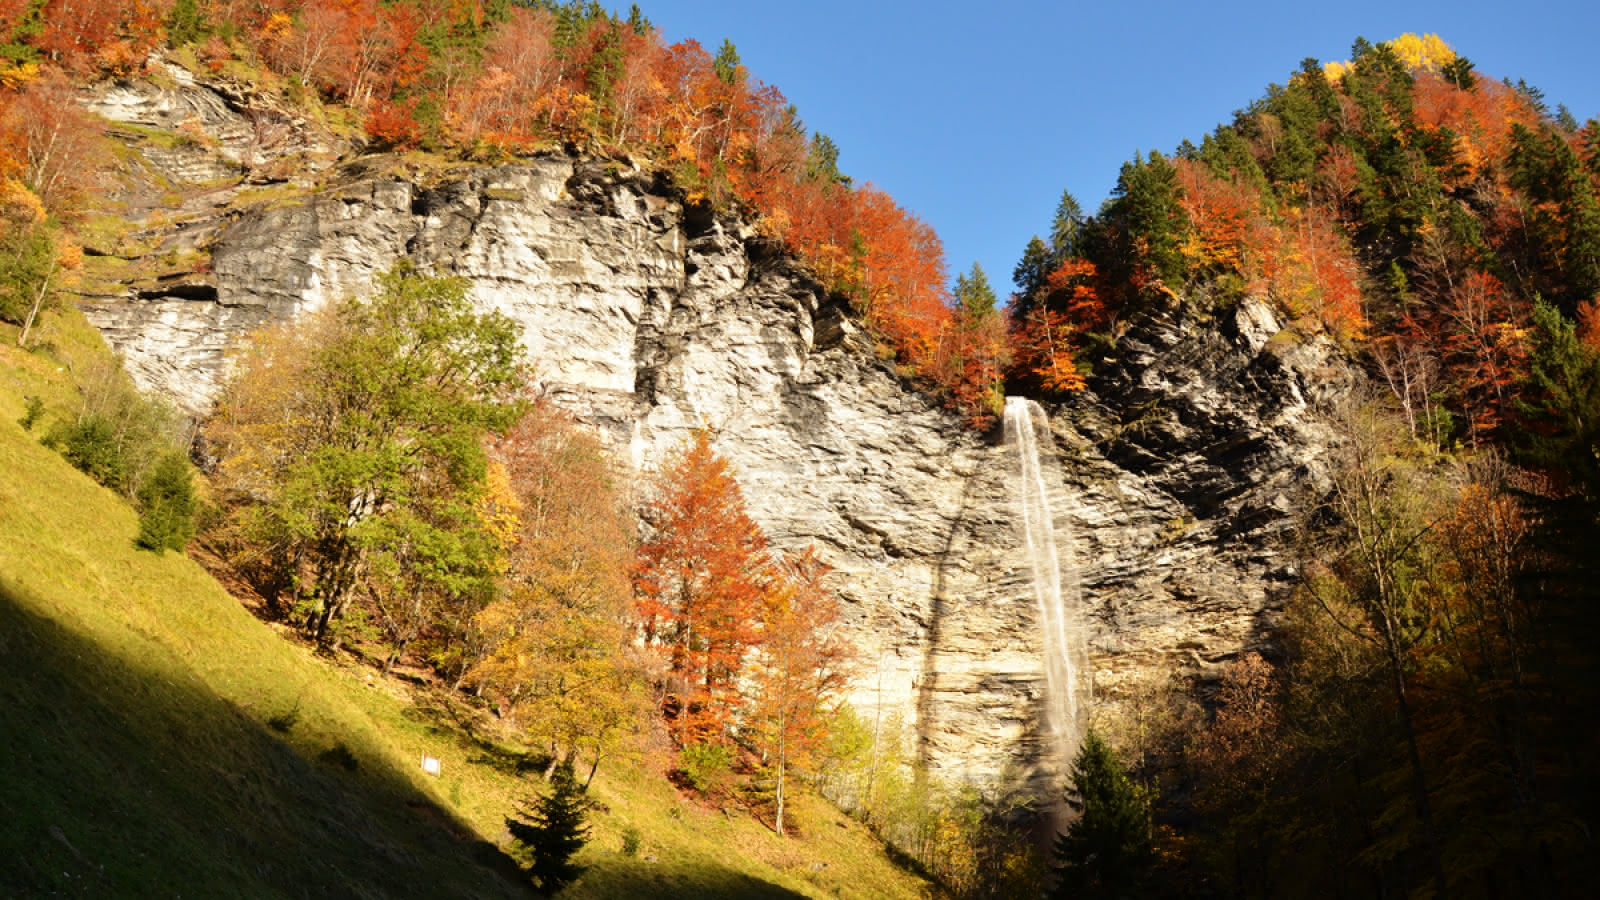 Cascade du Dard - La Giettaz - Automne